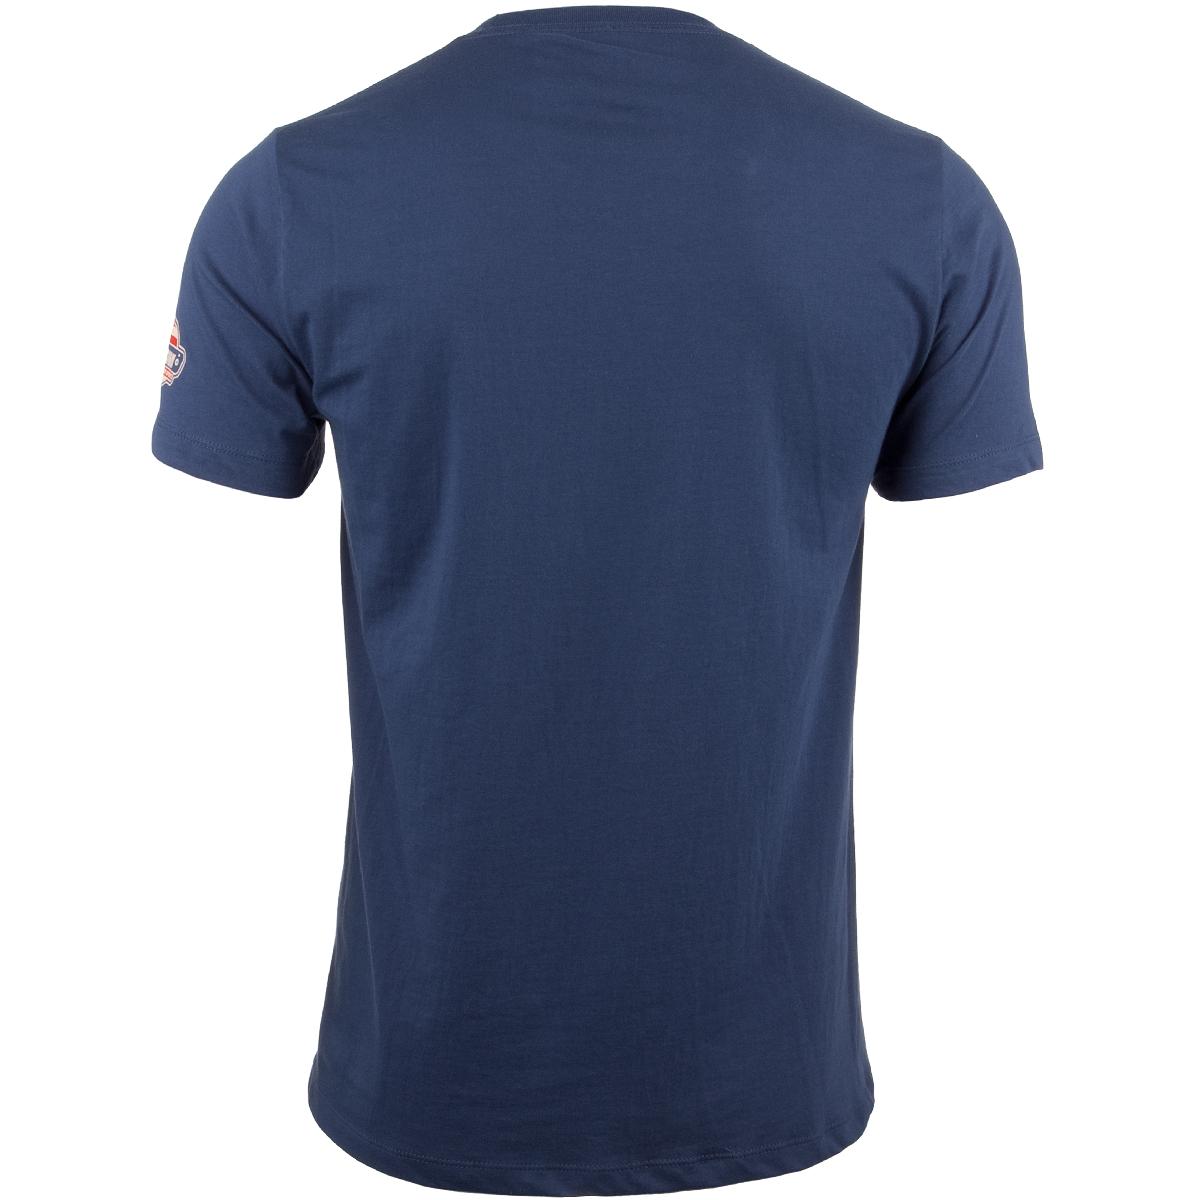 Design t shirt uk - 7 62 Design Veteran By Choice English Mens T Shirt Uk Marines Graphic Top Blue